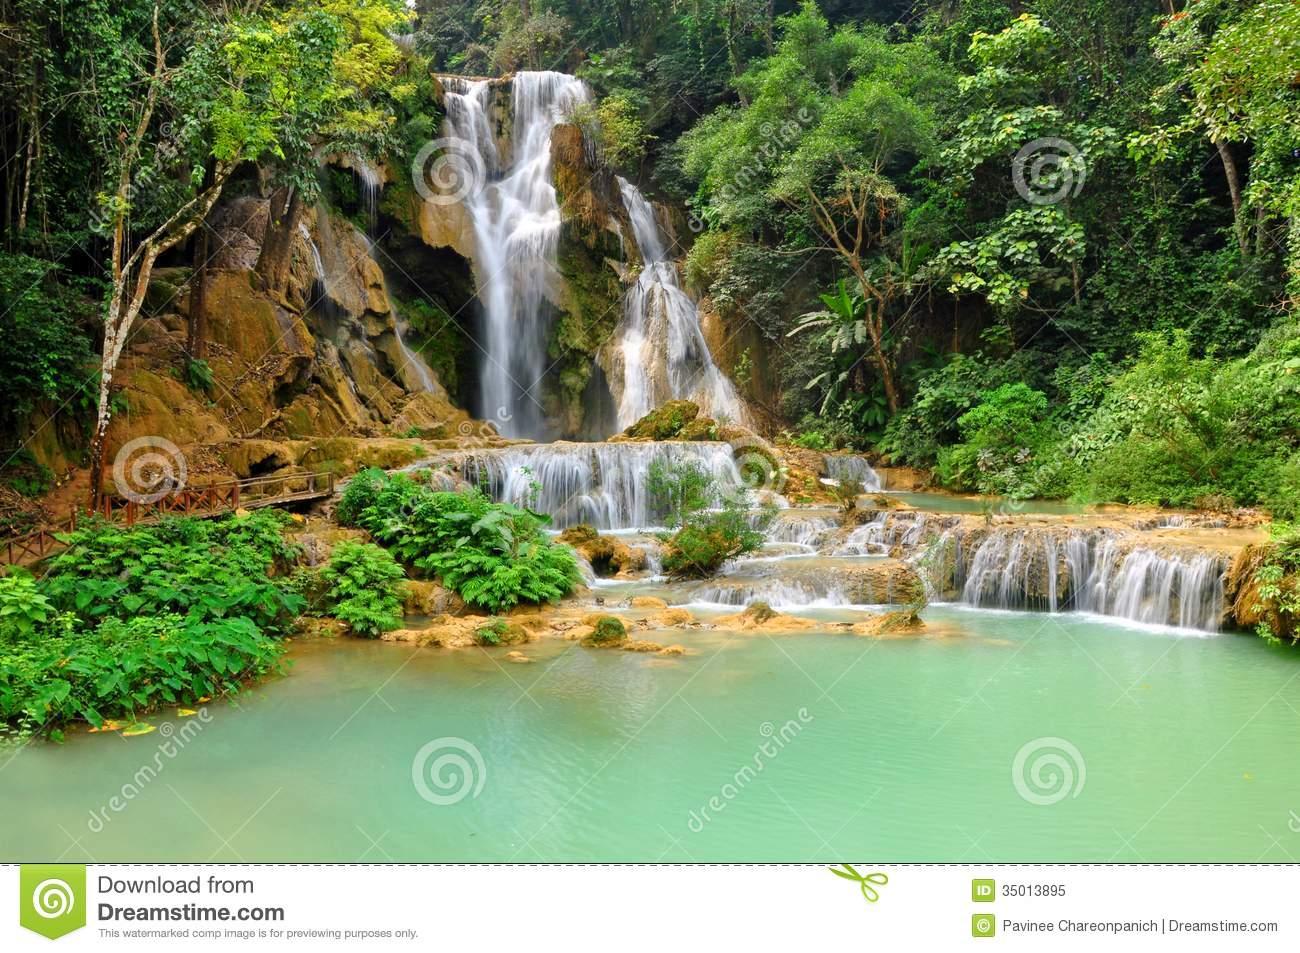 Kuang Si Waterfall clipart #14, Download drawings